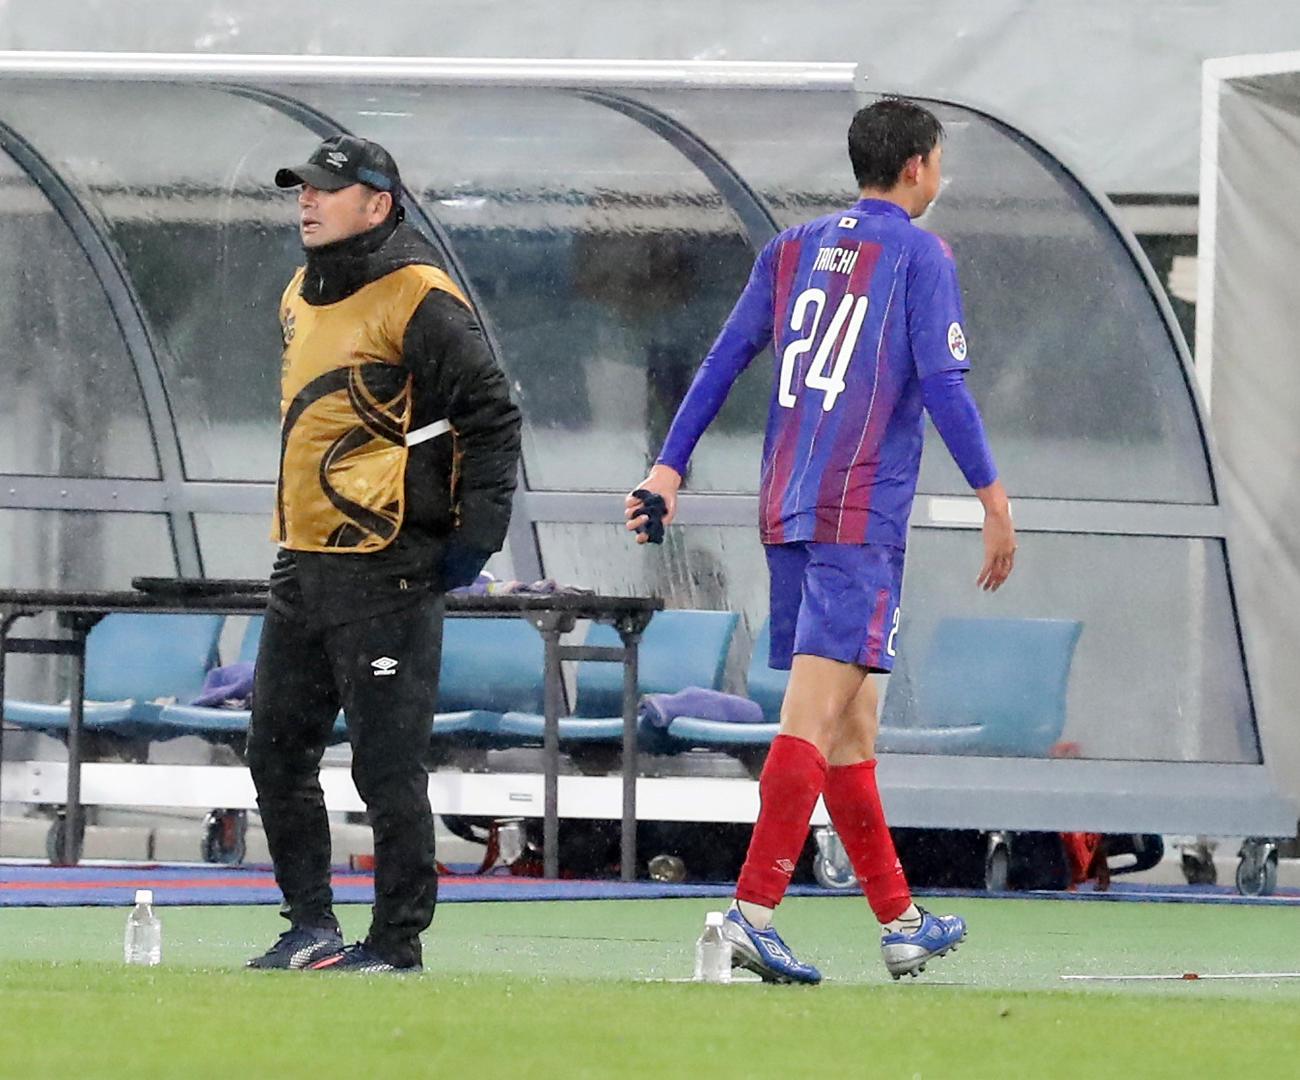 ACL東京対セレス・ネグロス 後半、相手とボールを競り合い反則でレッドカードを食らいベンチに引き揚げる東京FW原(右)。左は長谷川監督(撮影・浅見桂子)